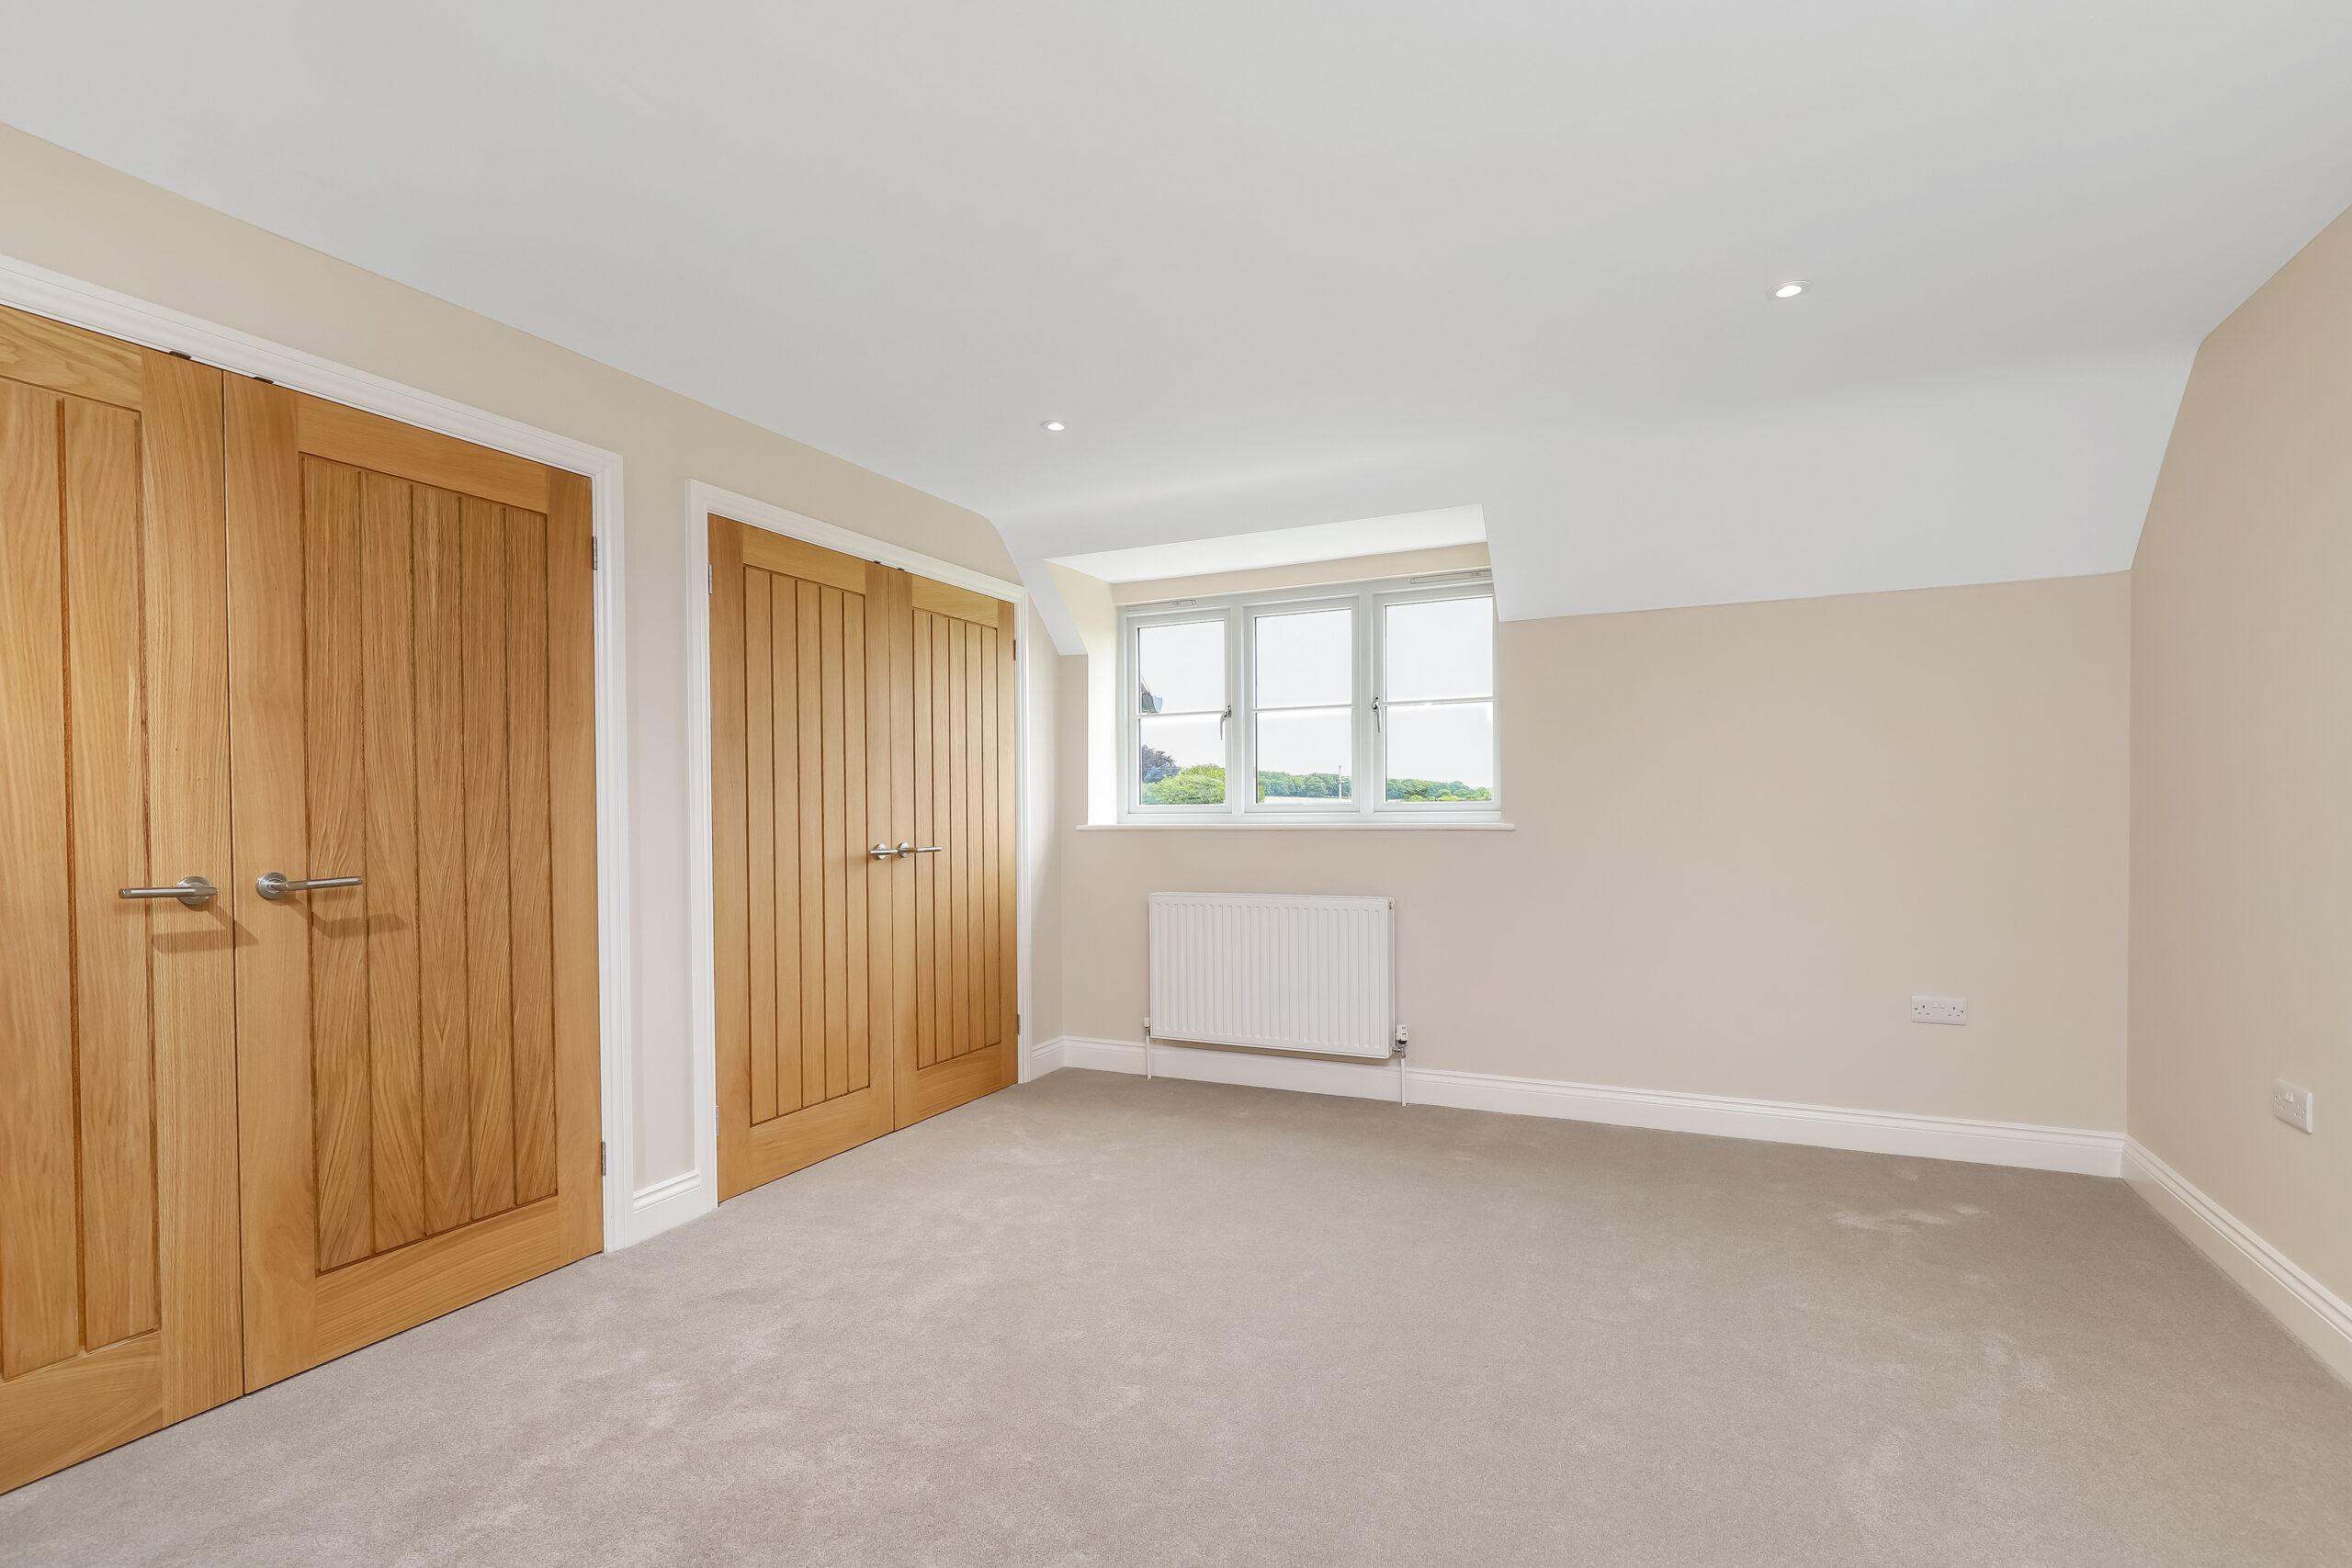 http://rbc-building.co.uk/wp-content/uploads/2020/09/Dove-Cottage-Master-Bedroom-scaled.jpg